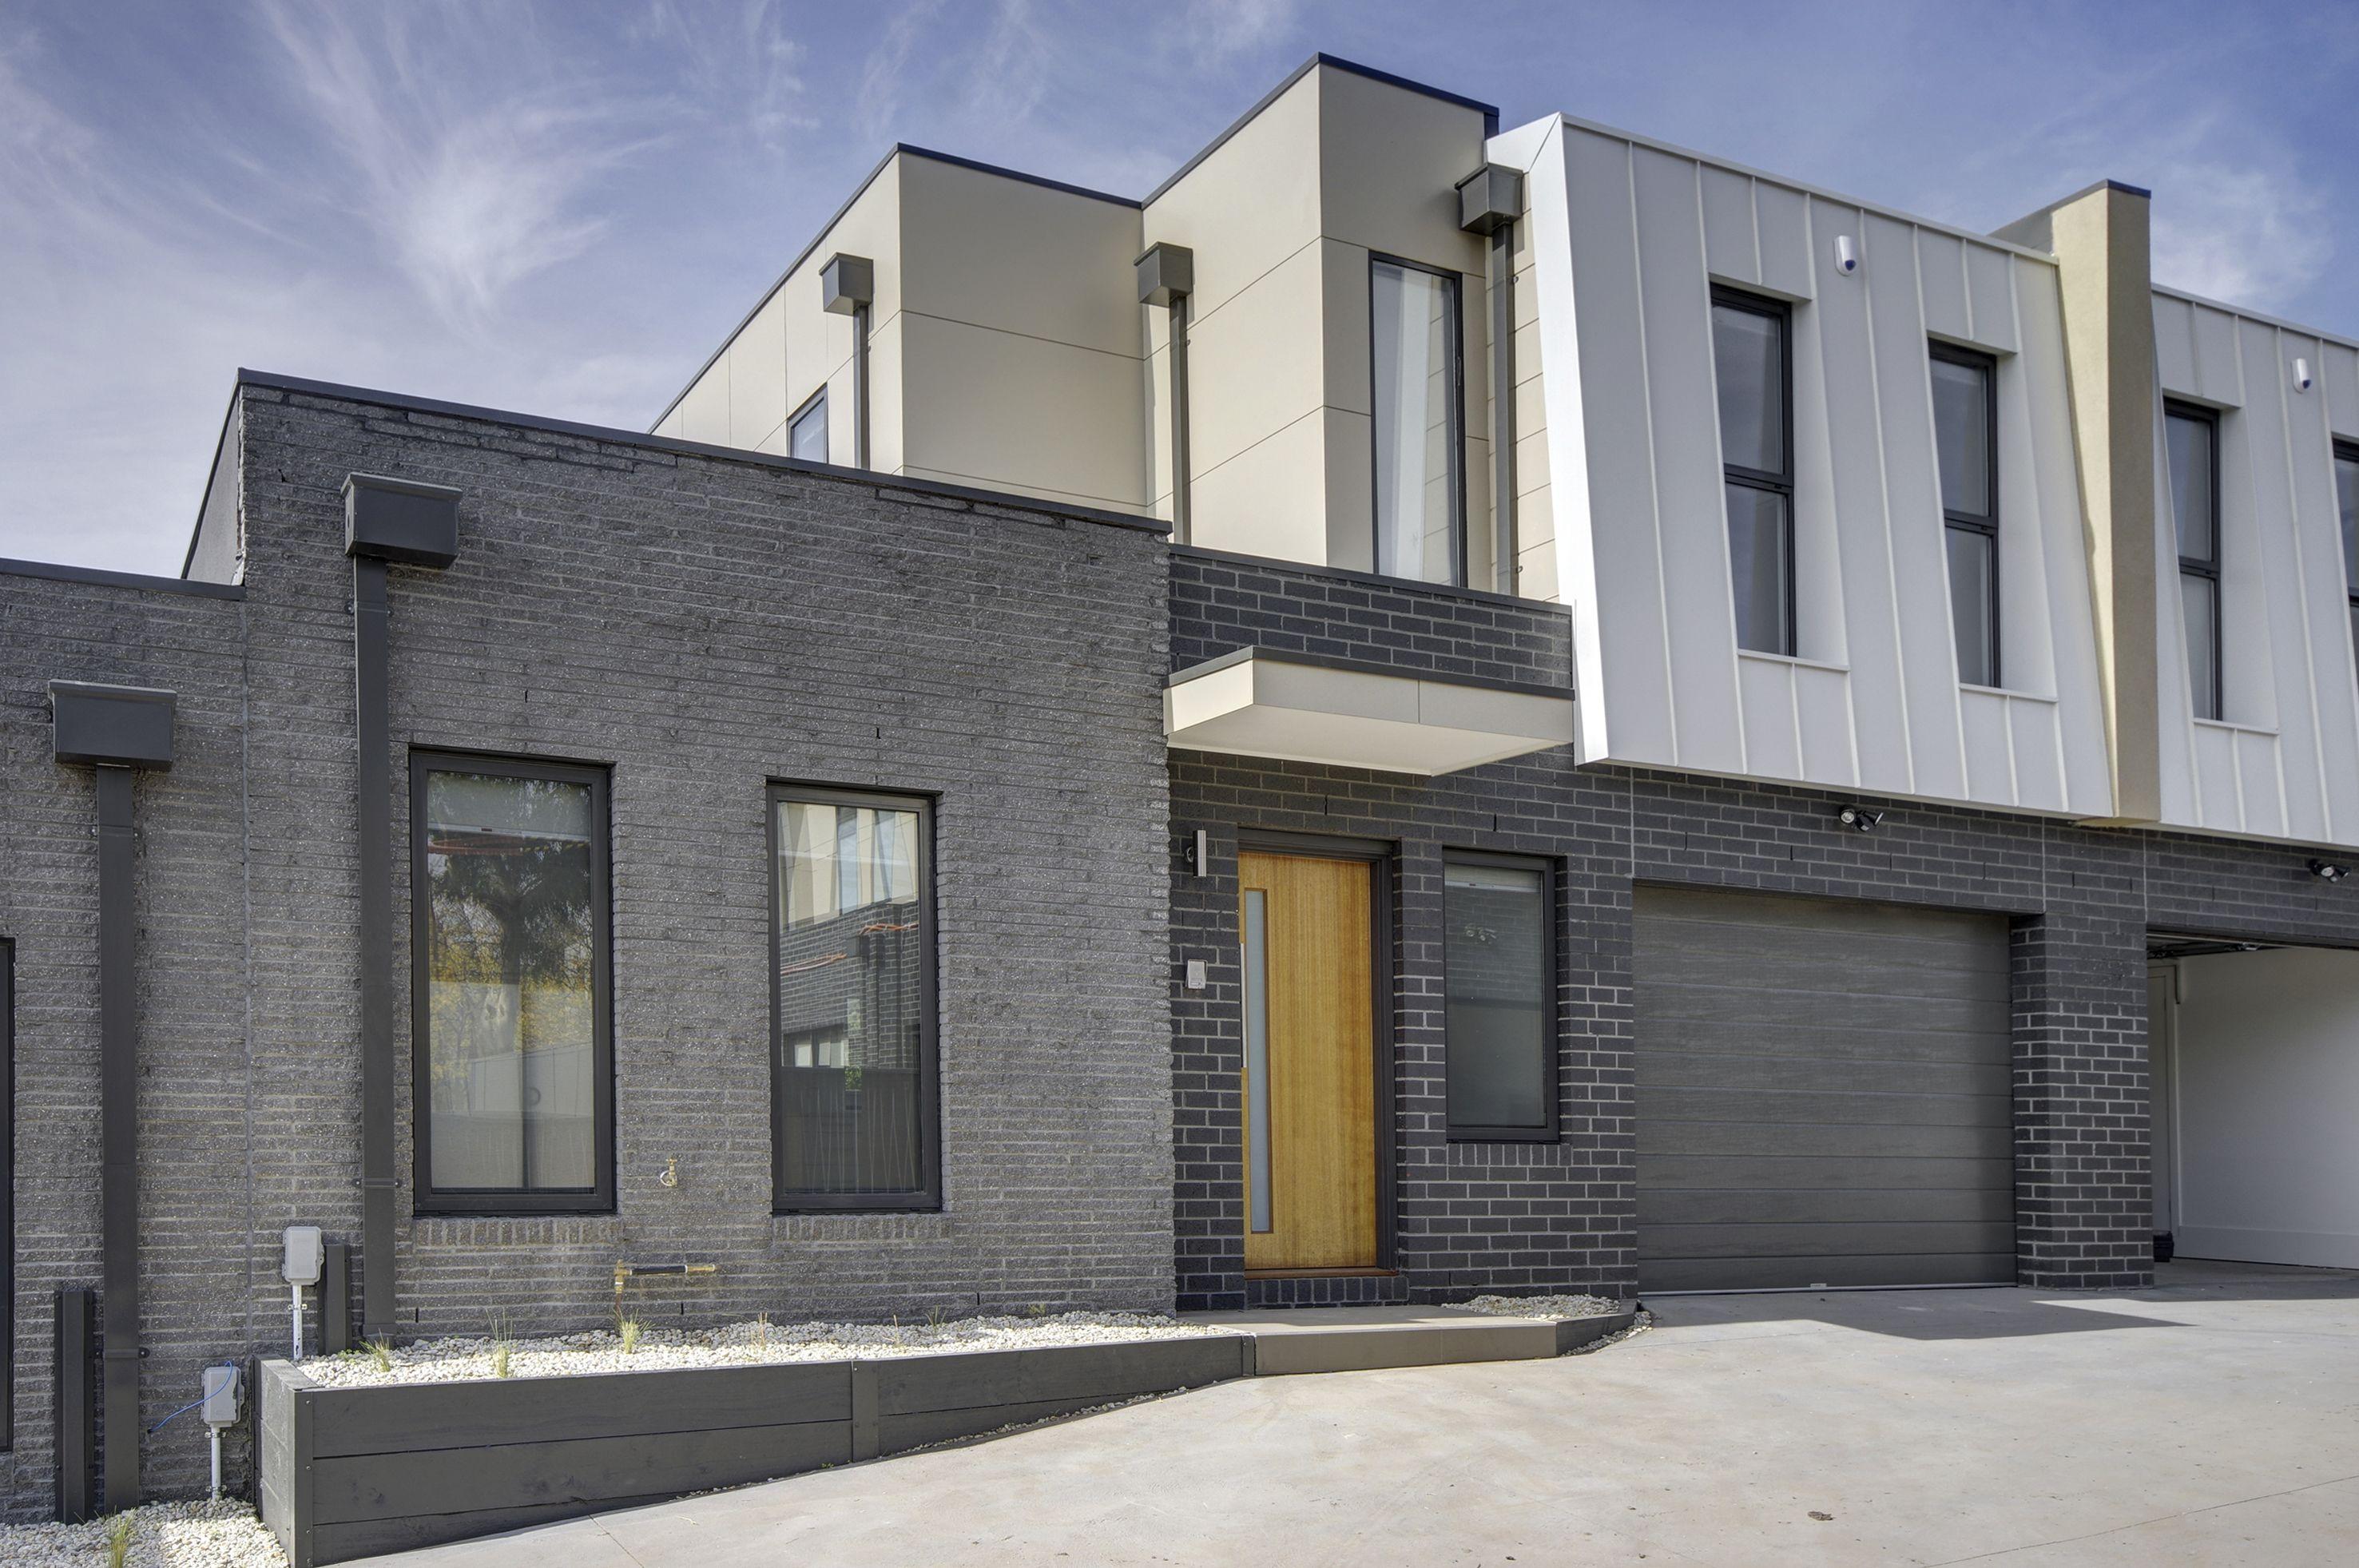 3/22 Villamanta Street</br>Geelong West